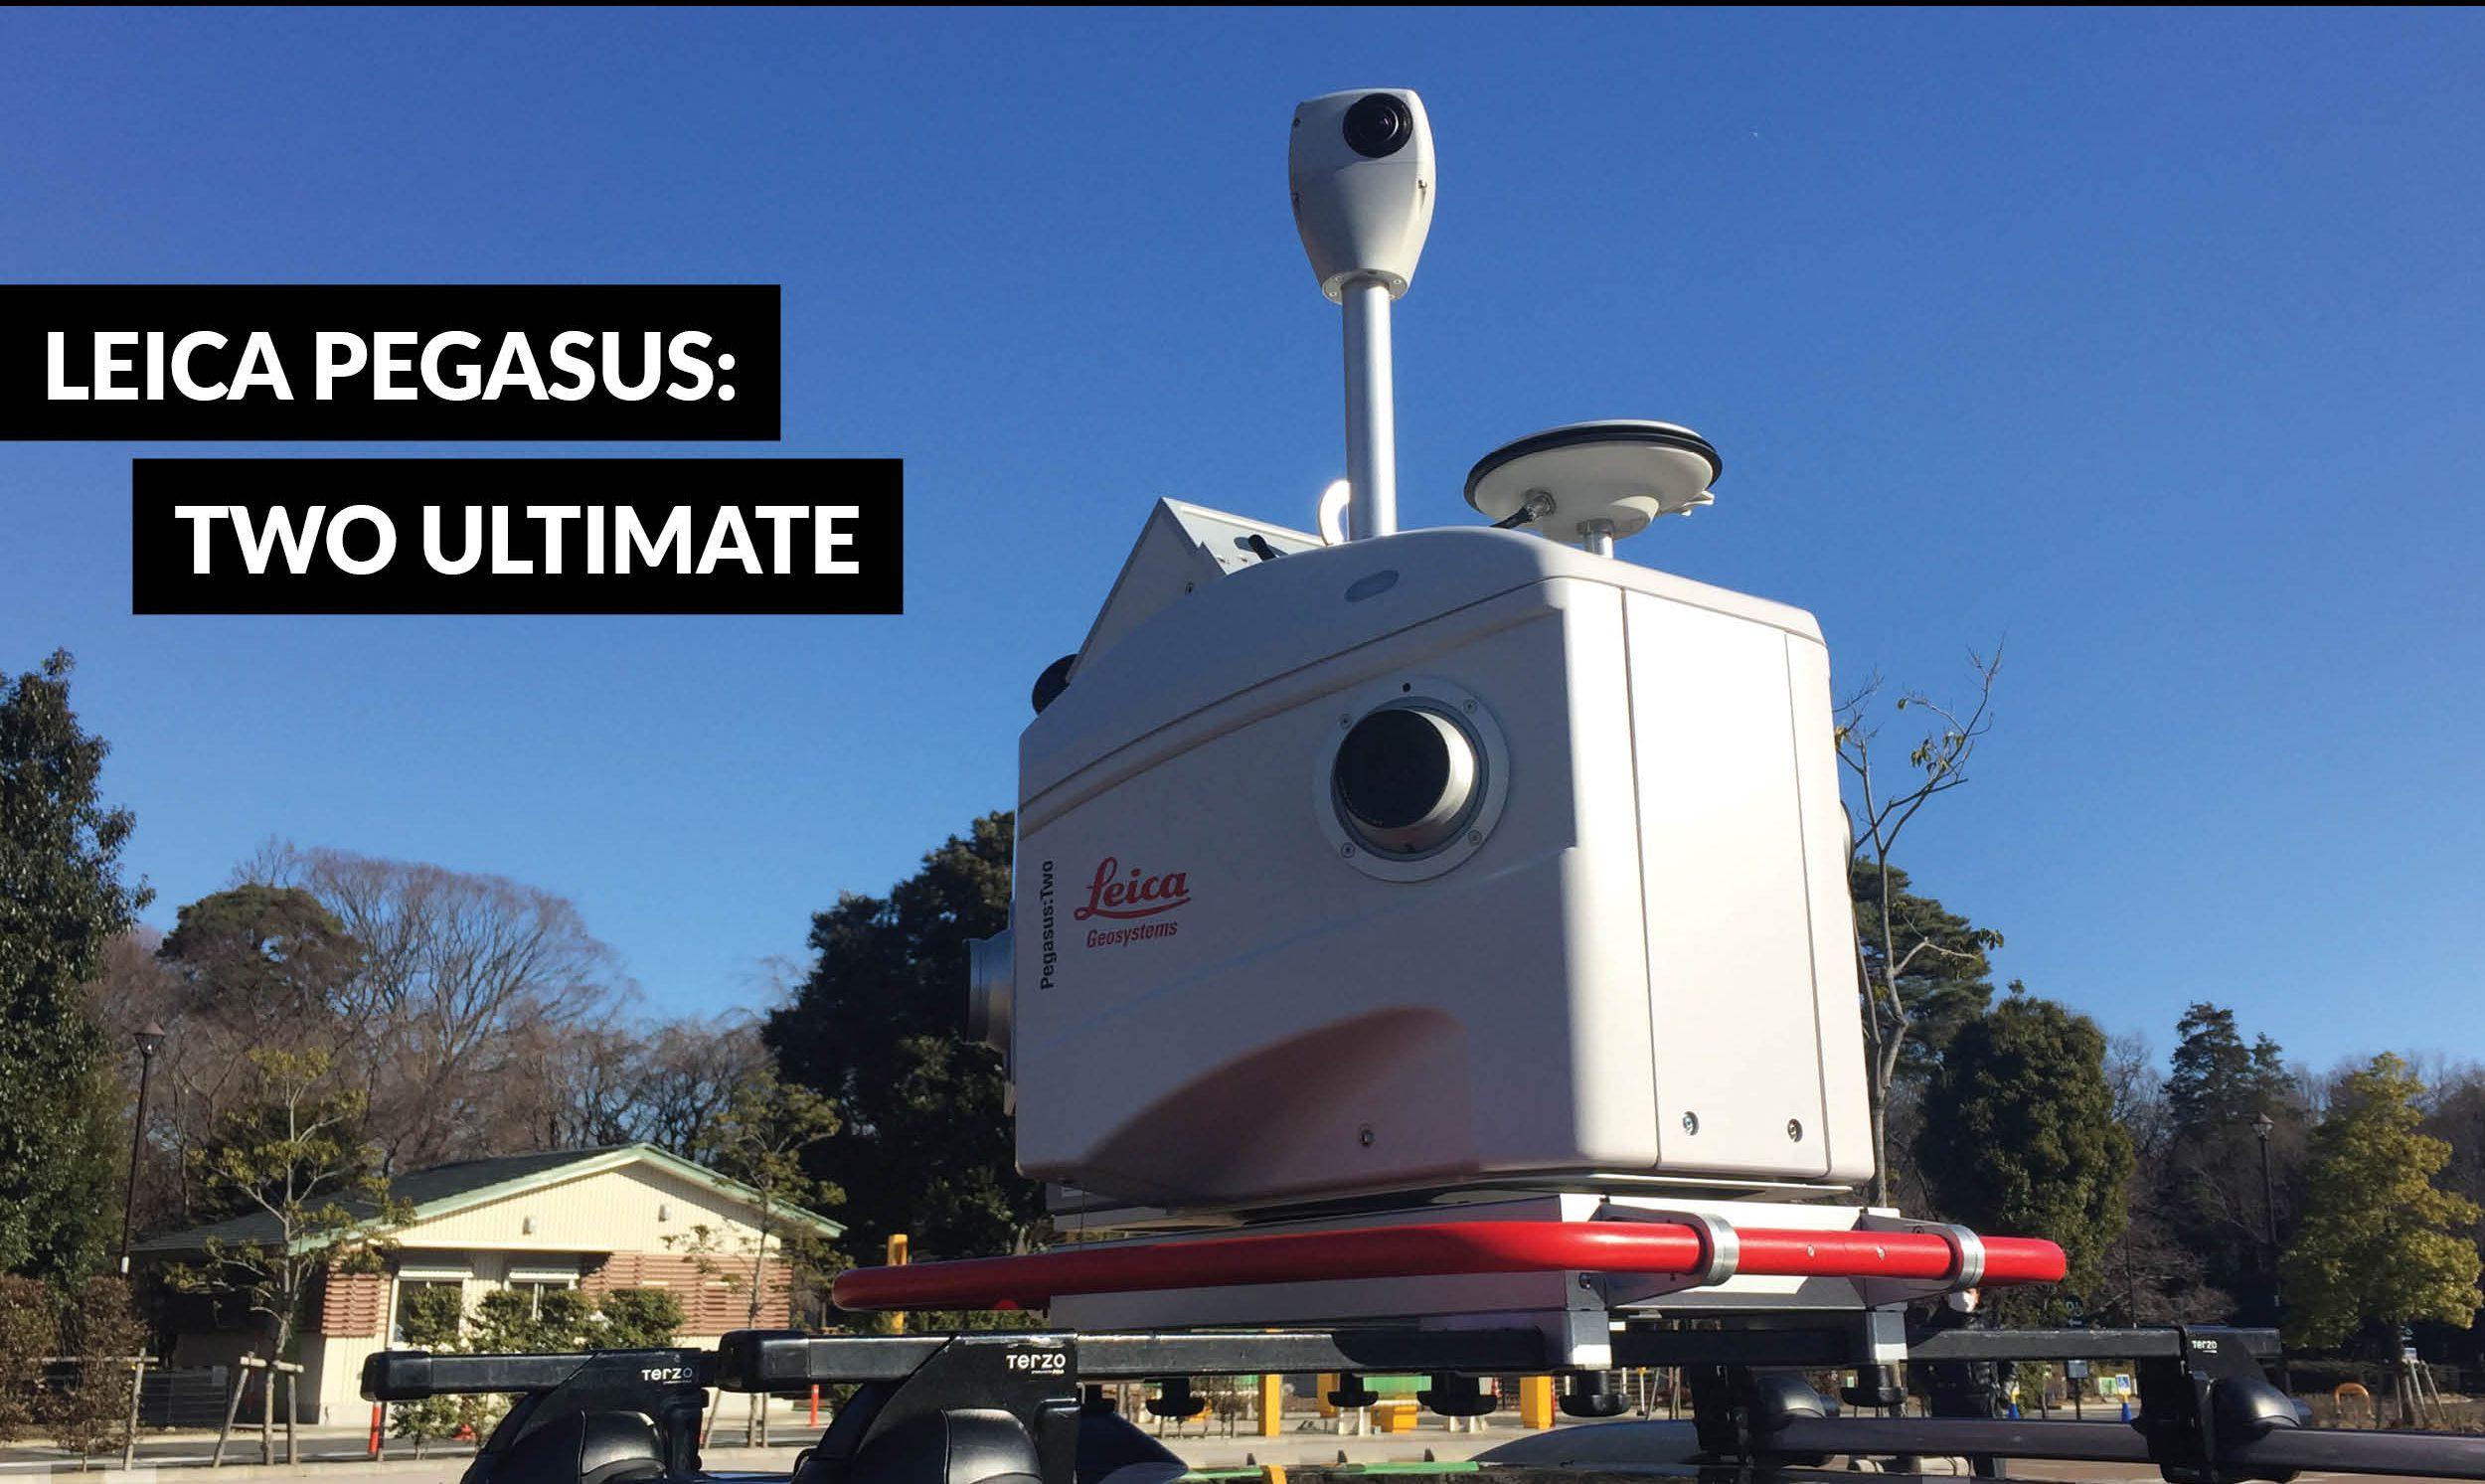 Hexagon Geosystems introduces new Leica Pegasus mobile